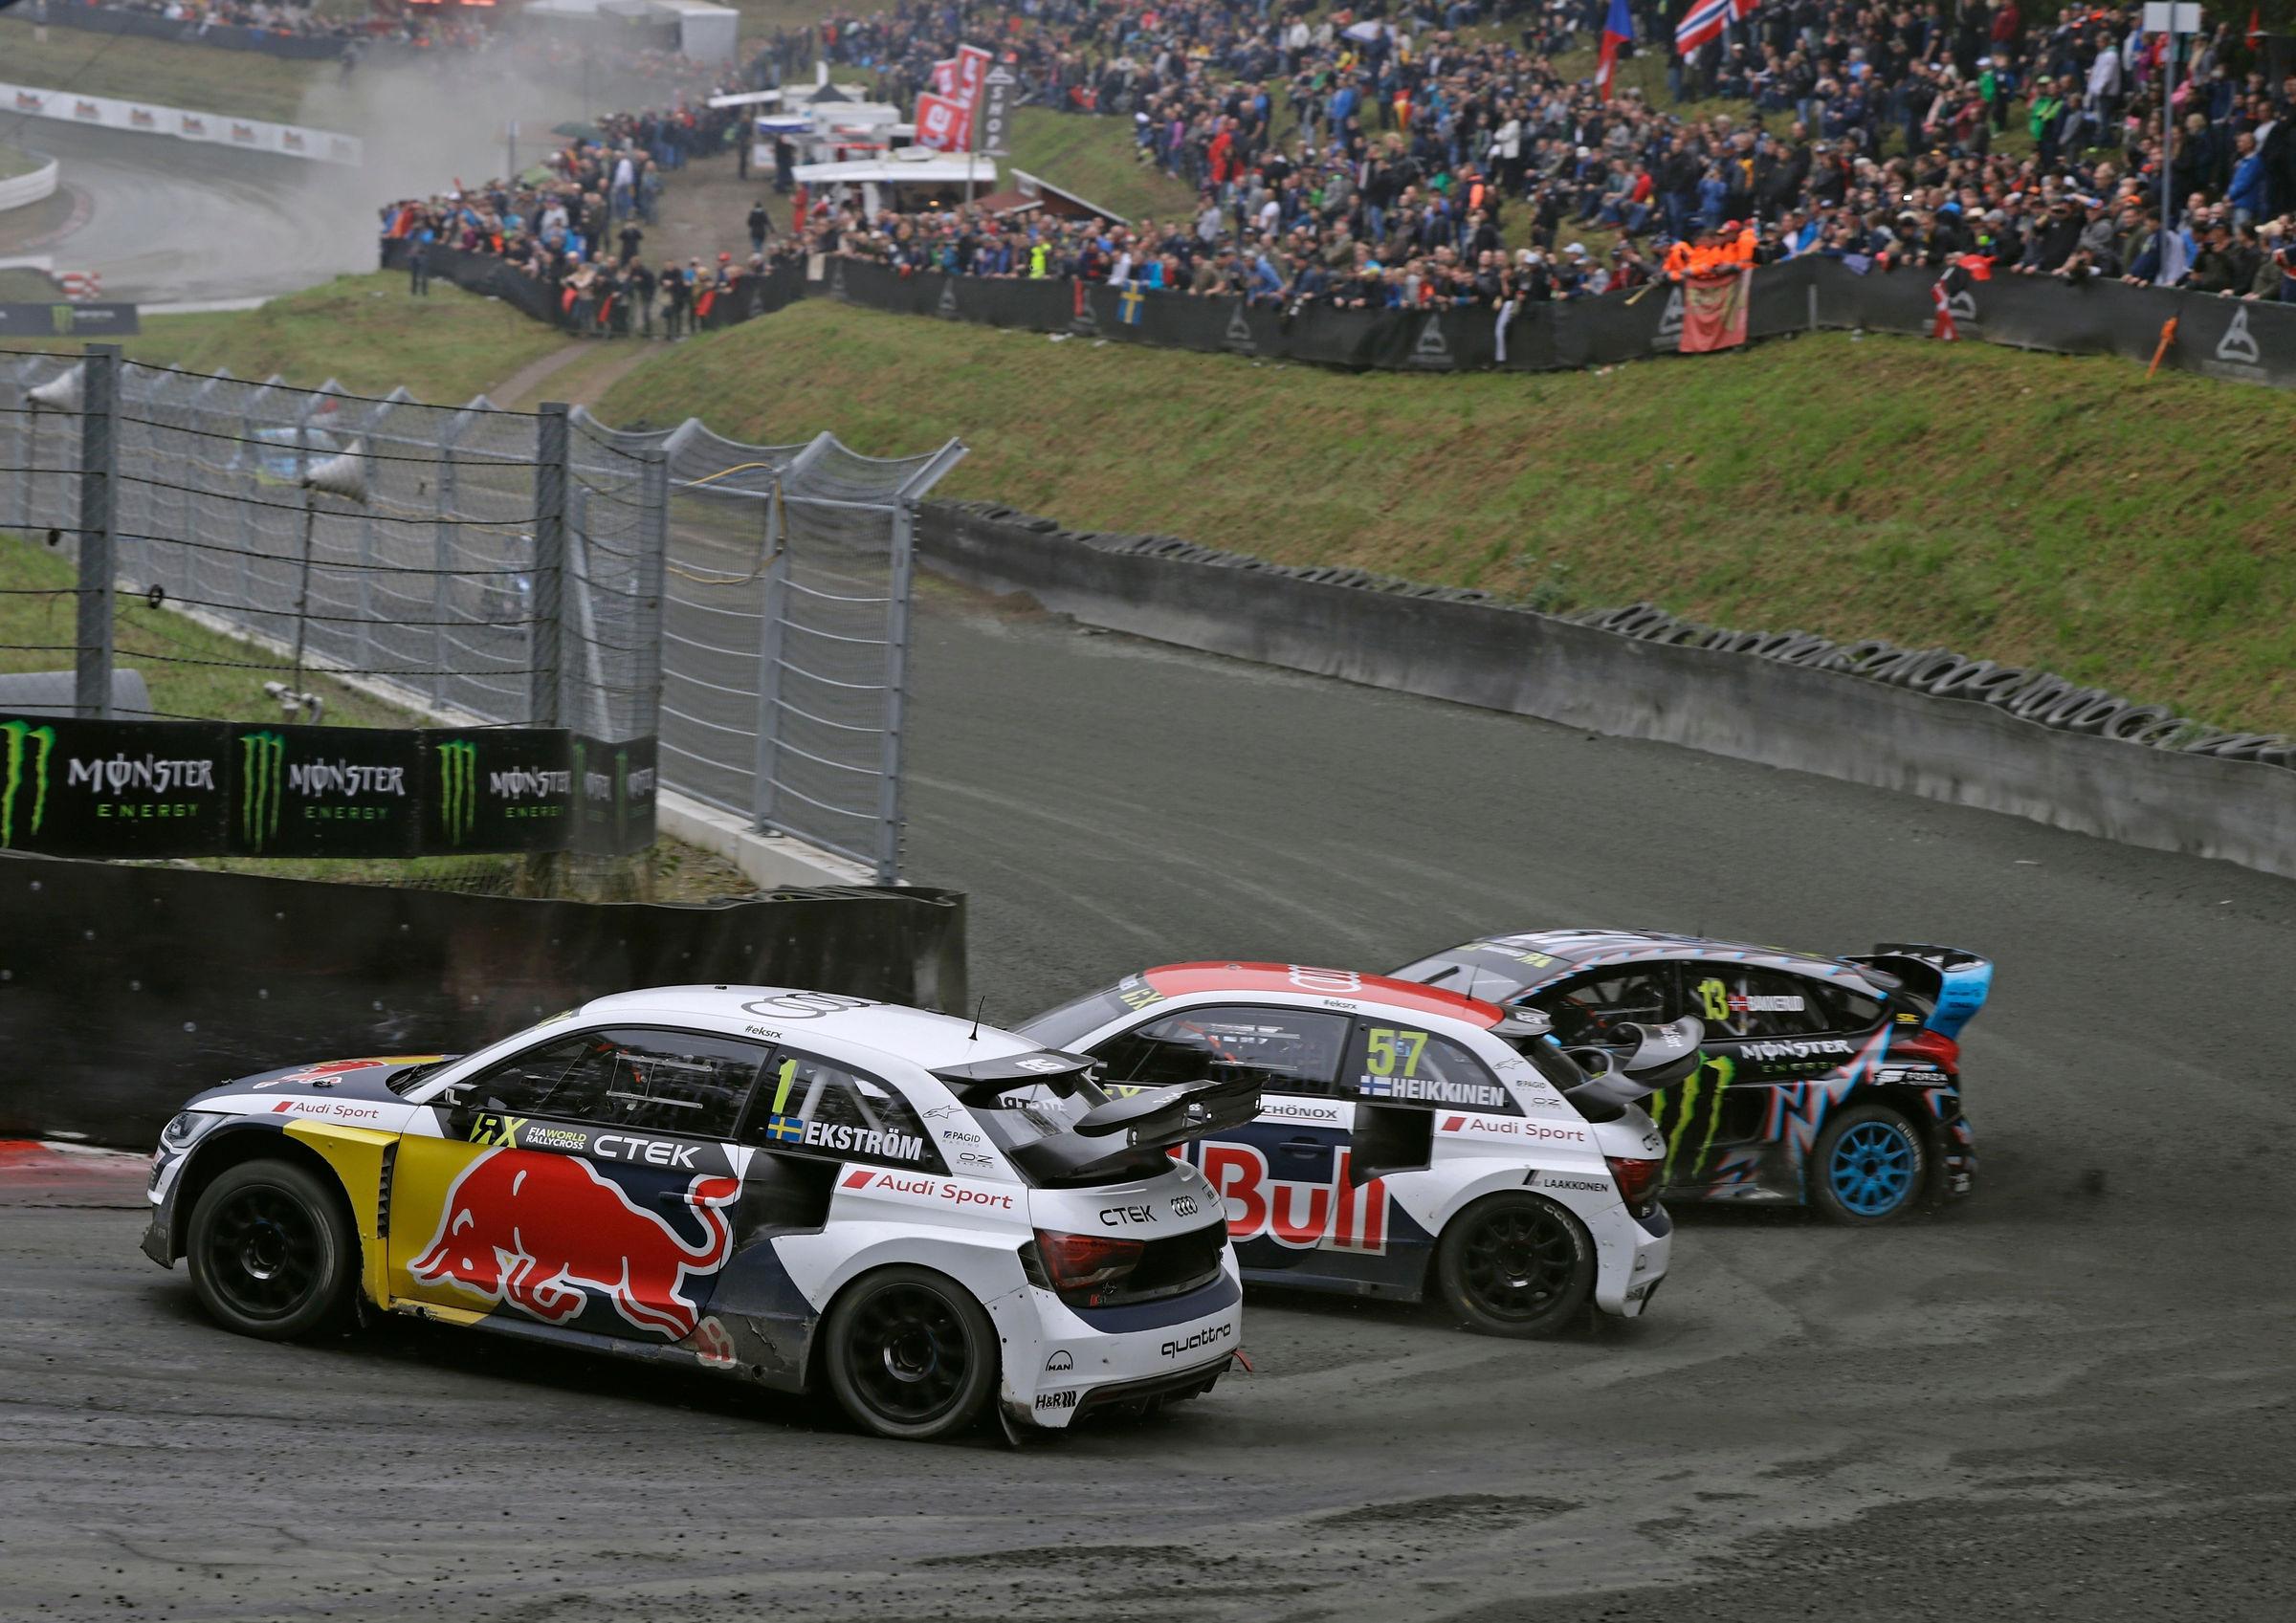 Ekstrom i pole position i tyskland